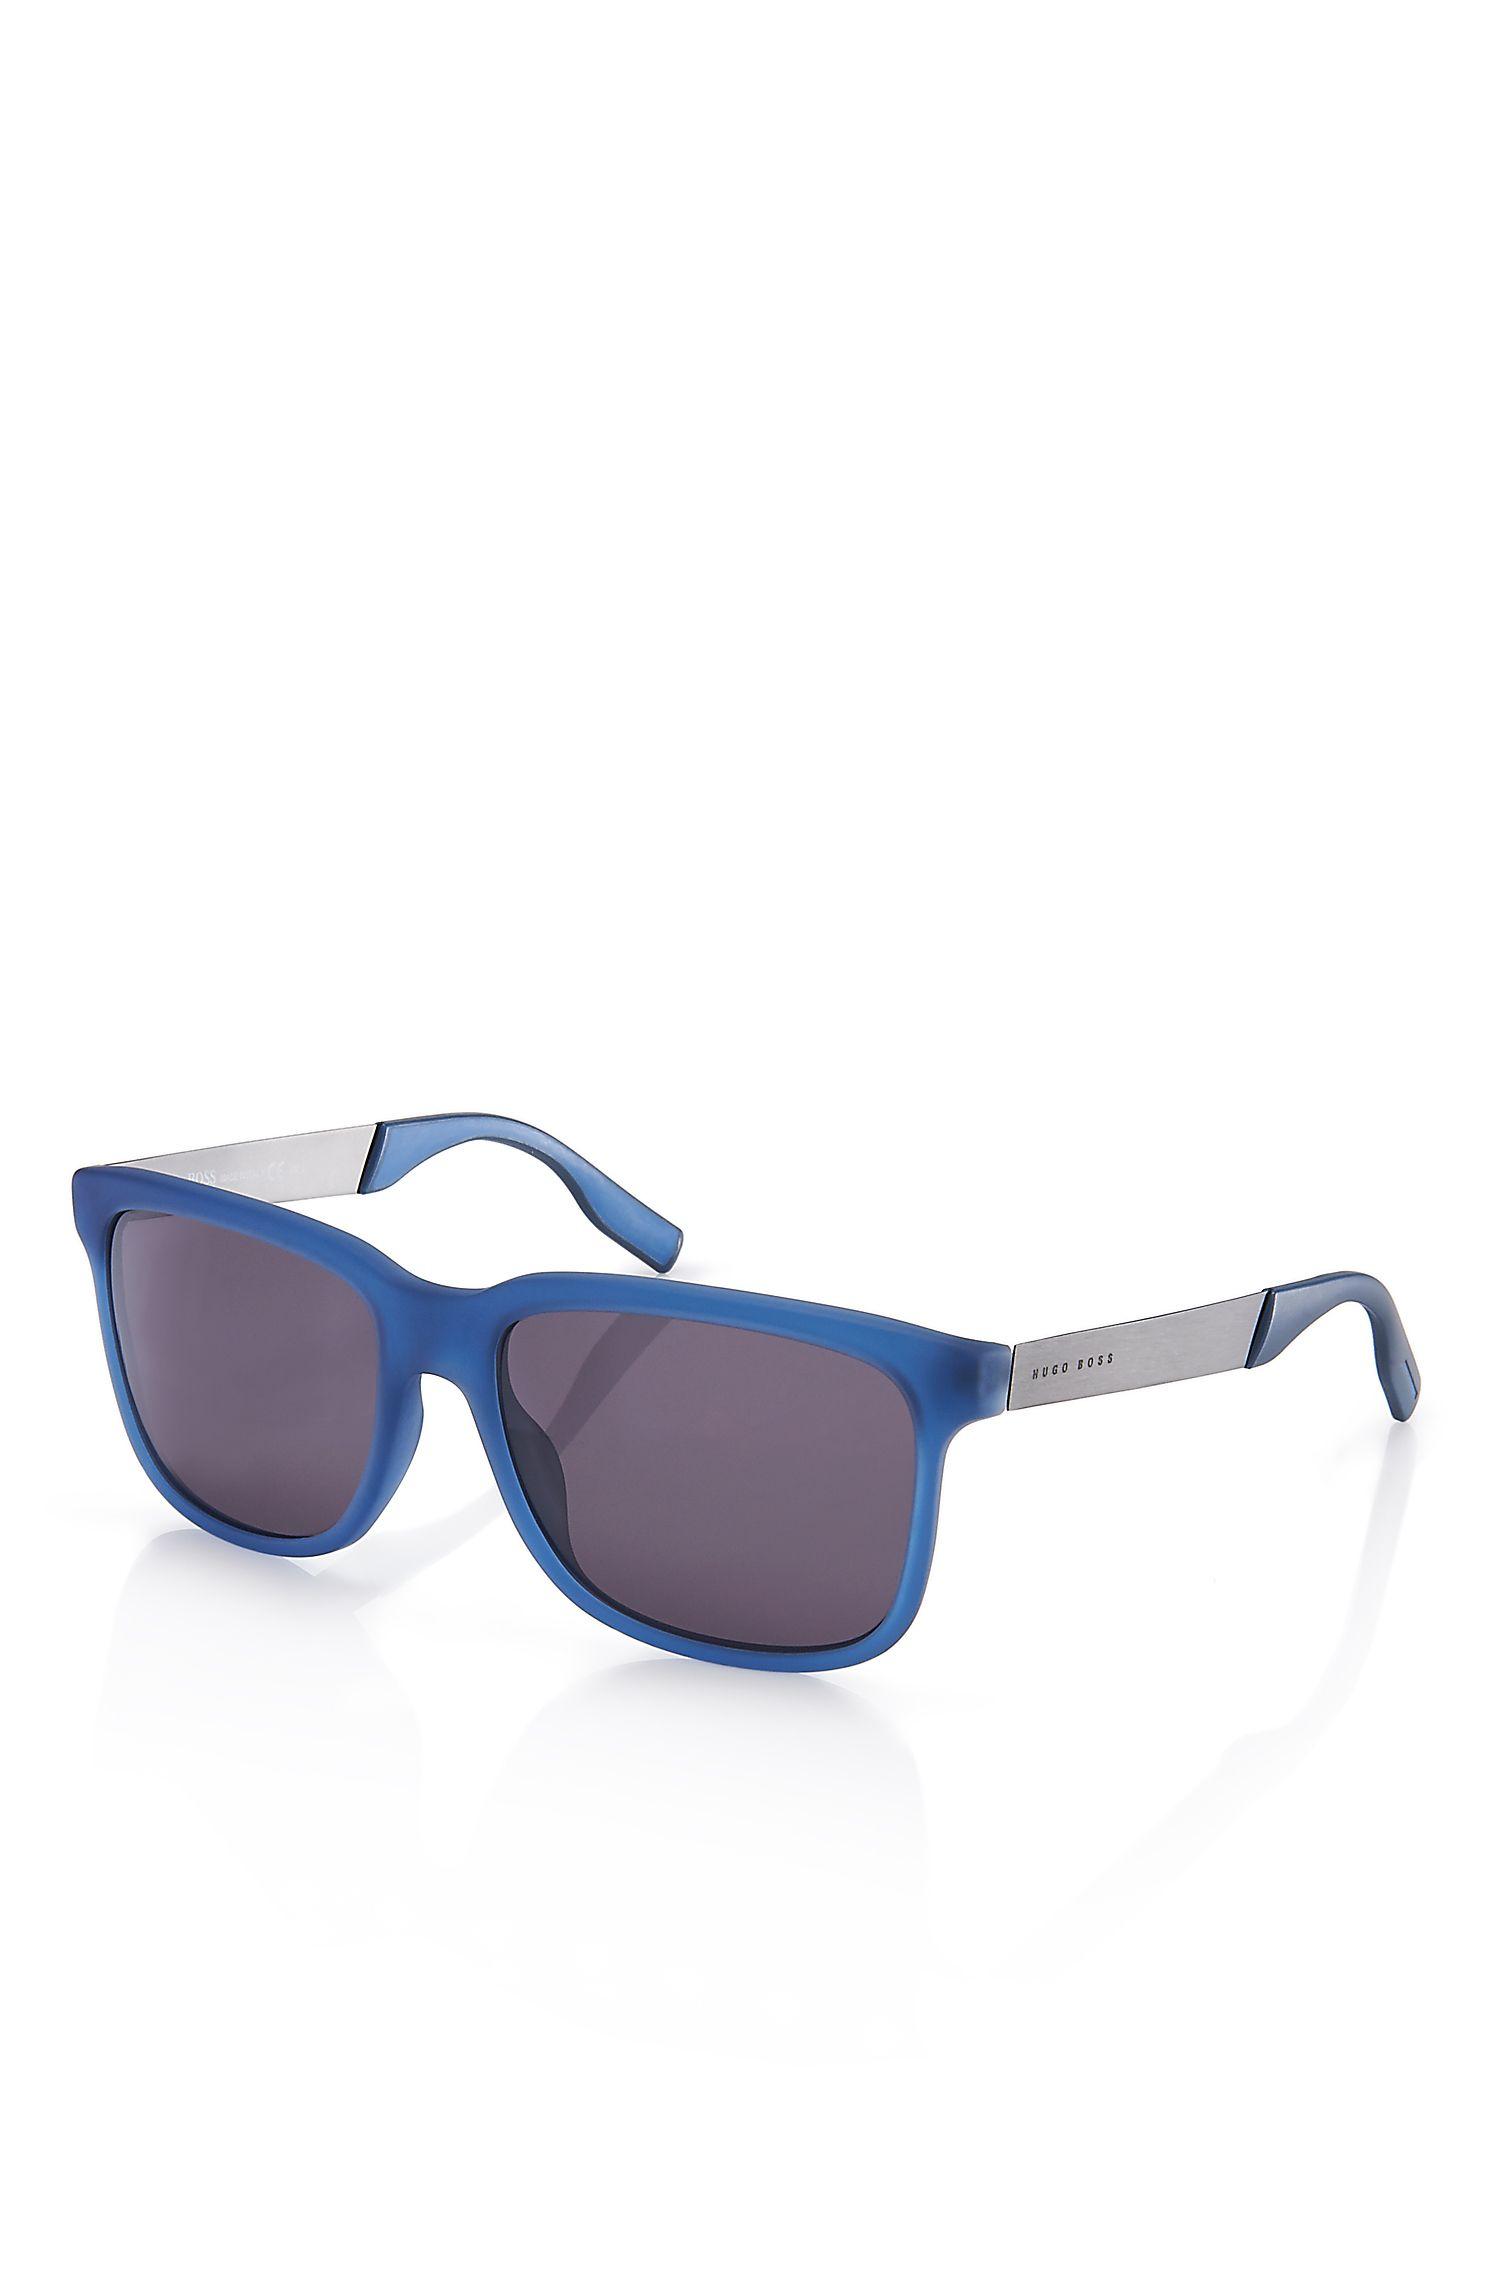 'Sunglasses' | Silver and Blue Polarized Sunglasses